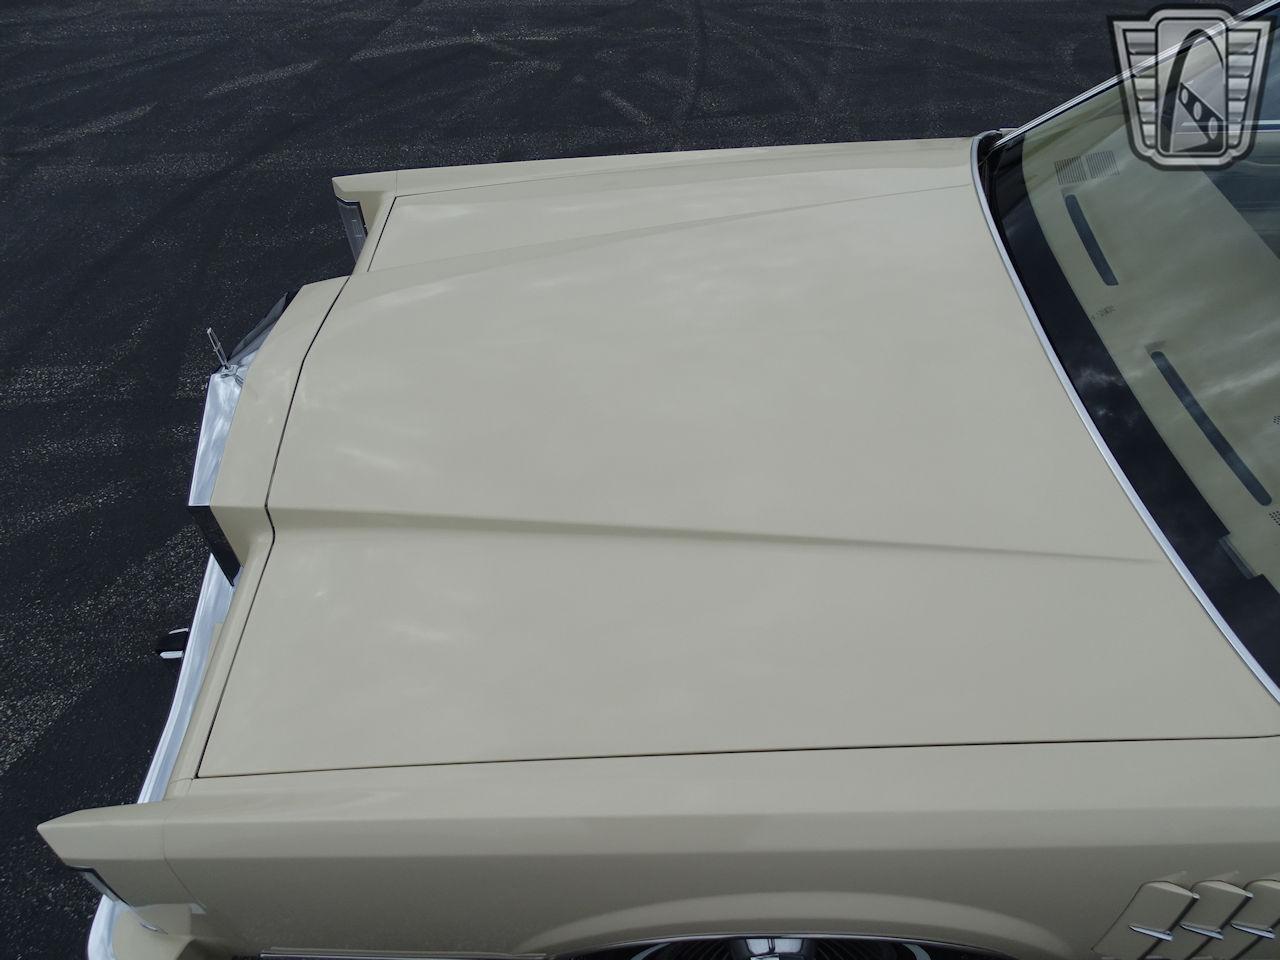 1983 Lincoln Continental 89